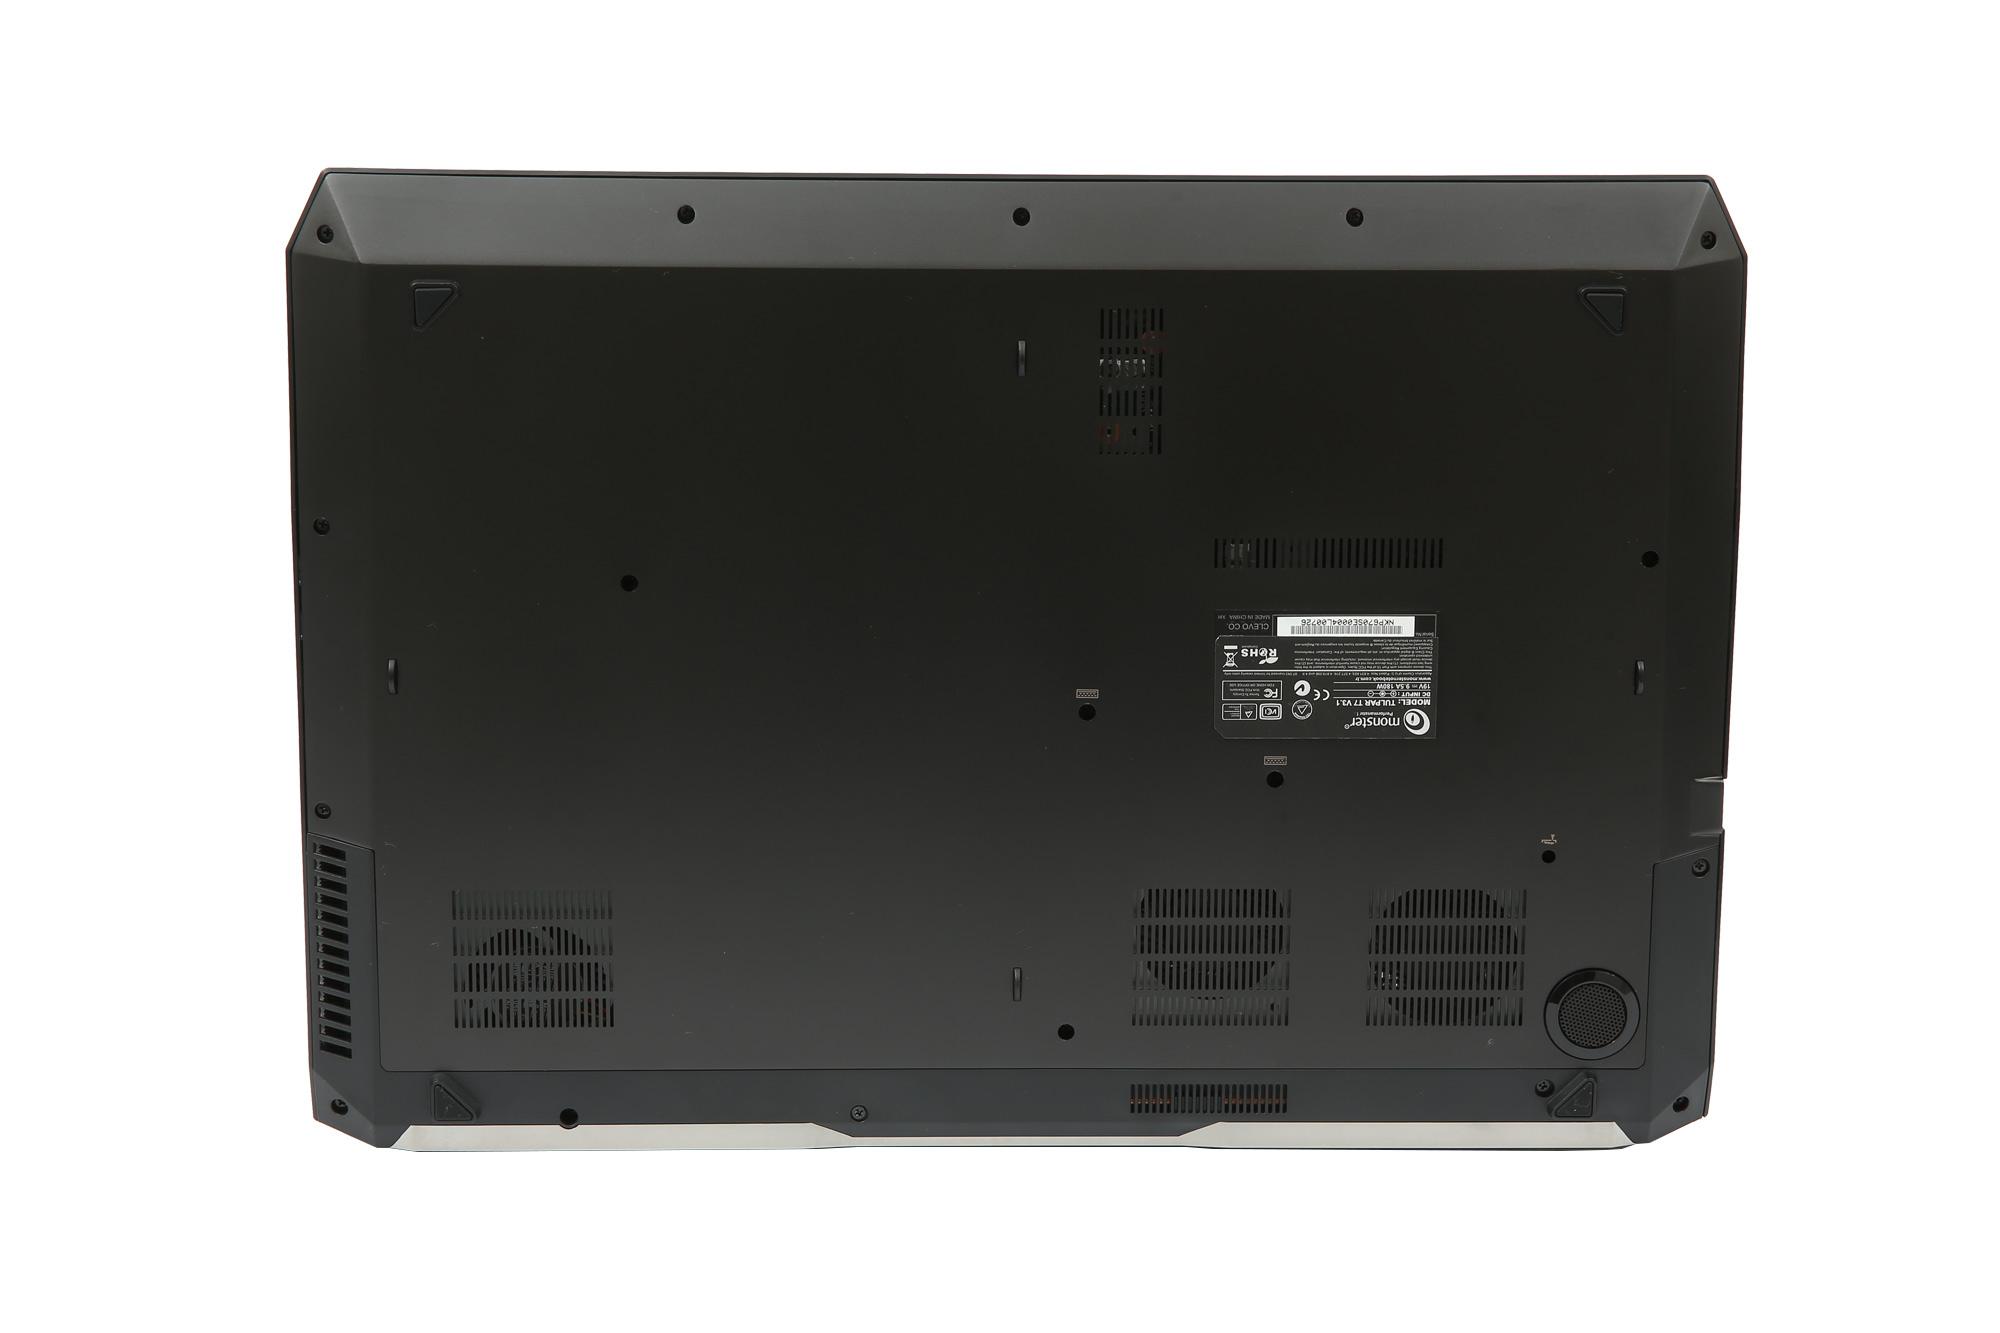 MONSTER® TULPAR T7 V3.1.1 17.3